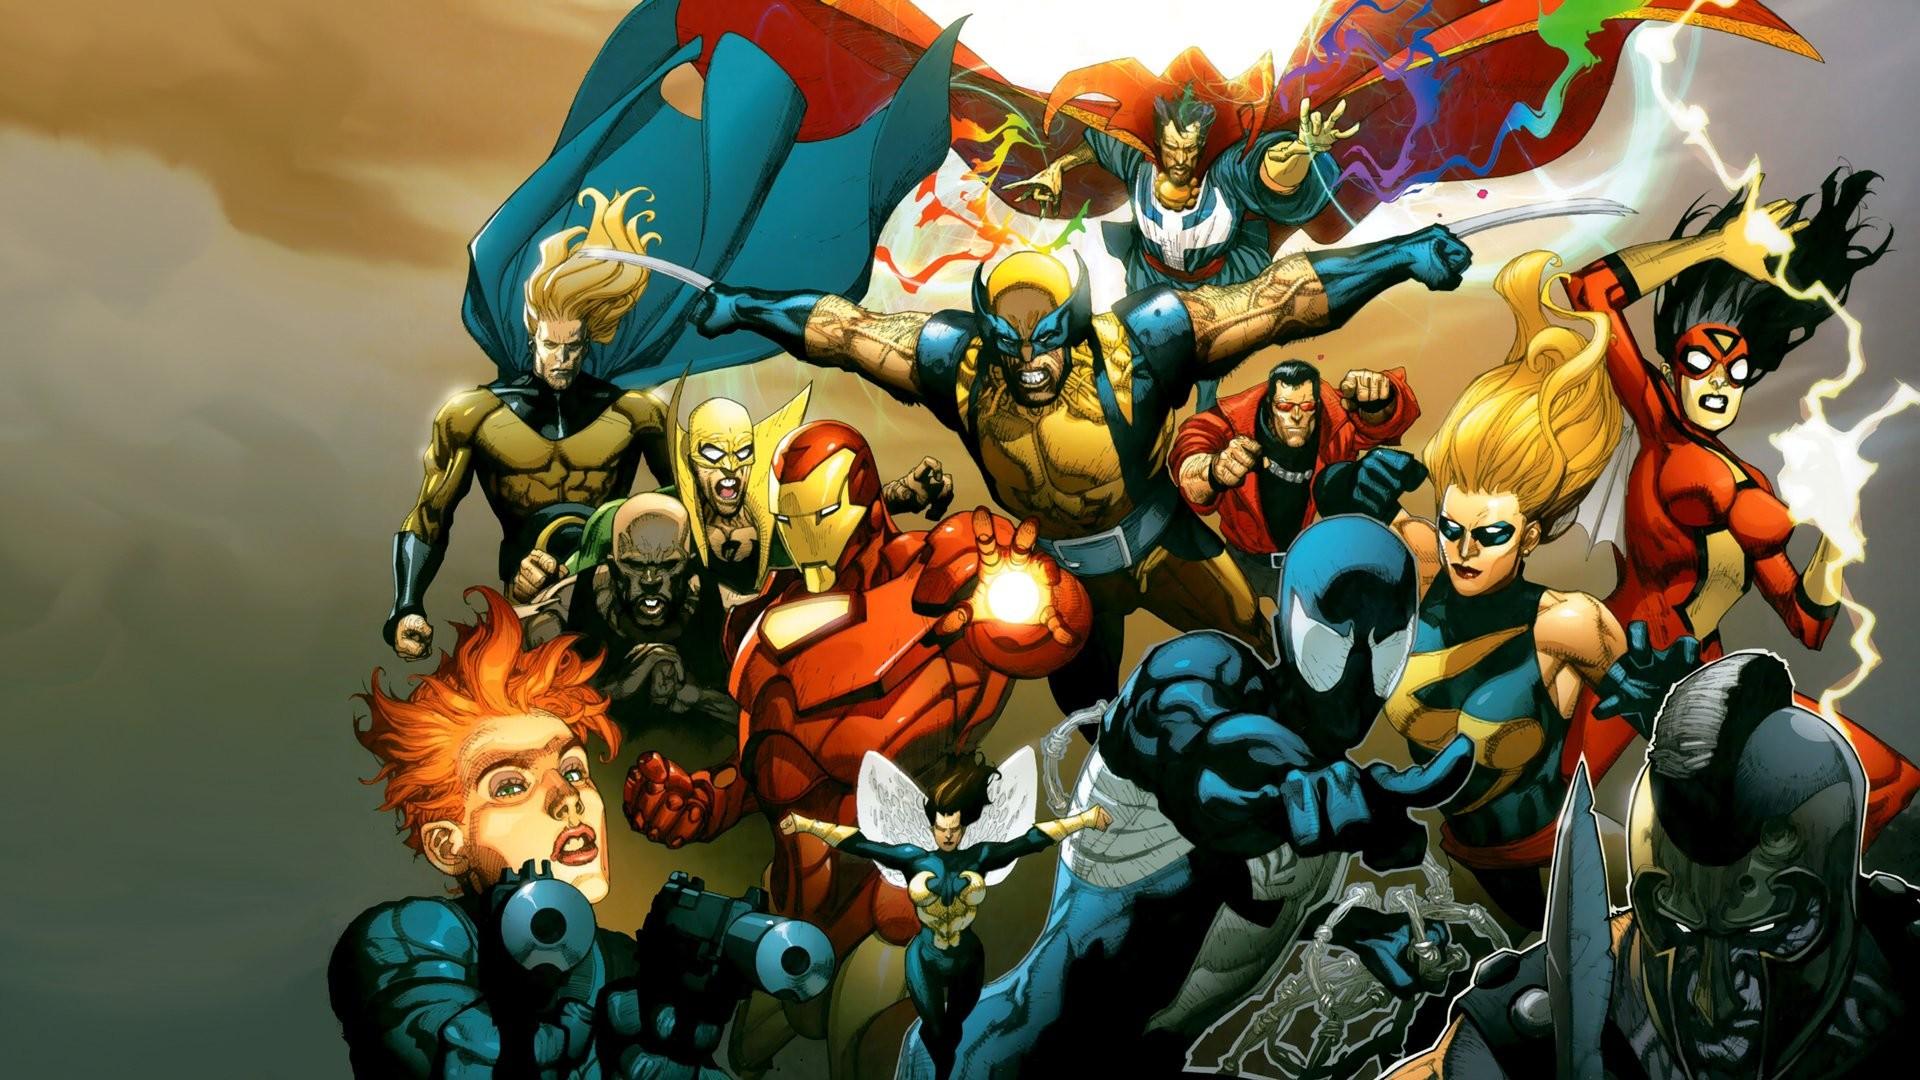 Marvel Wallpaper Wallpaper Background Hd Anime Wallpapers